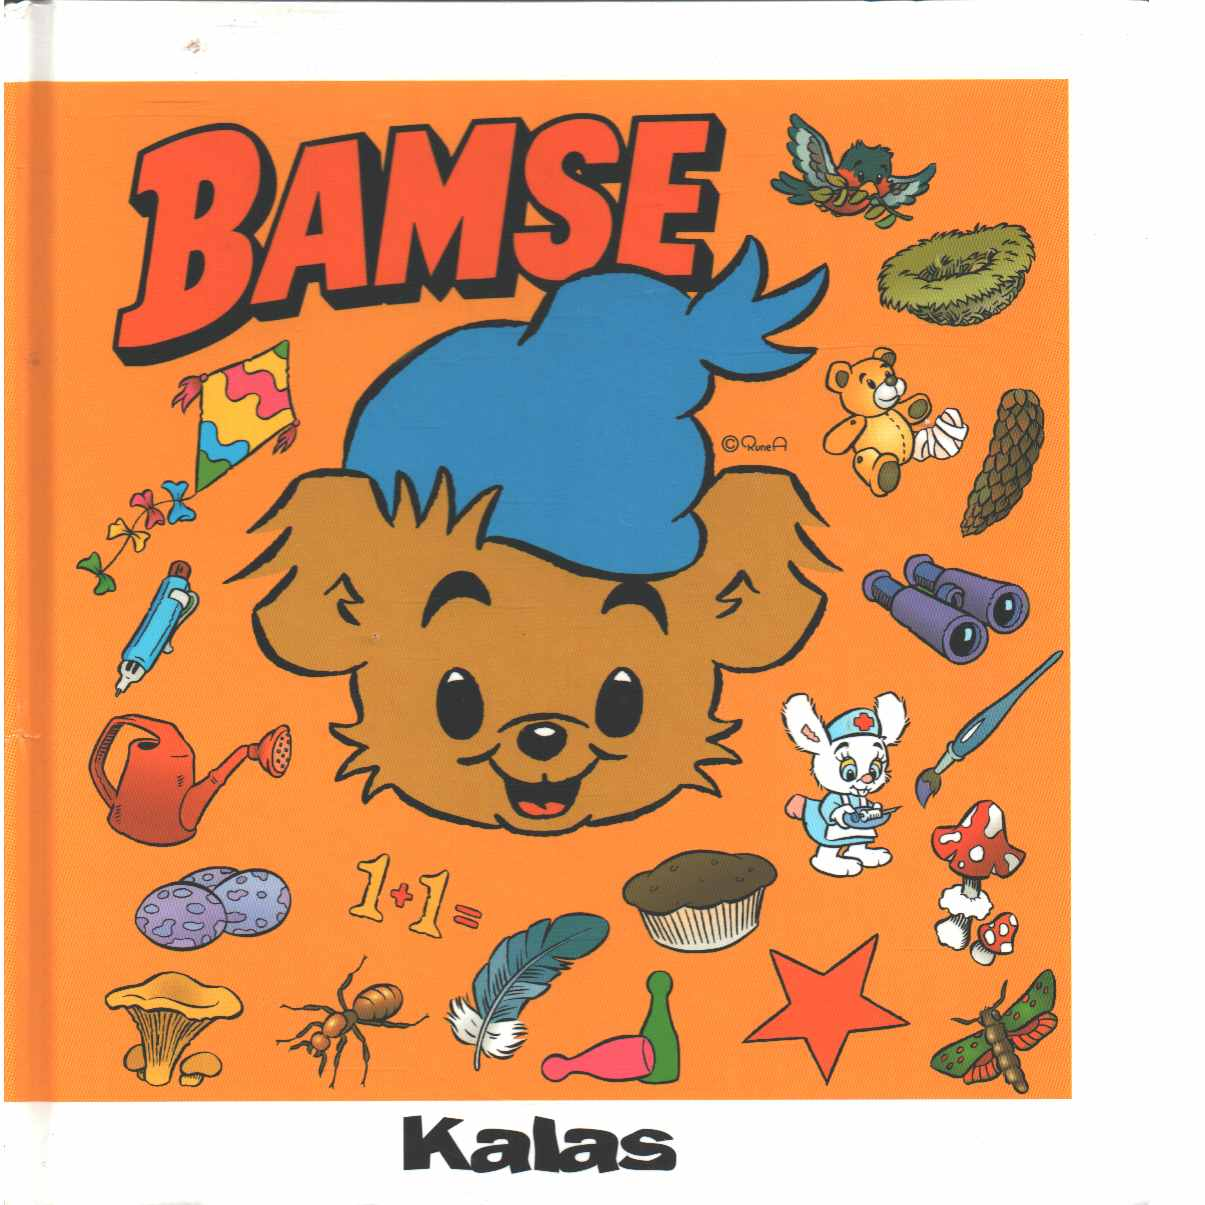 Kalas - Andréasson, Rune